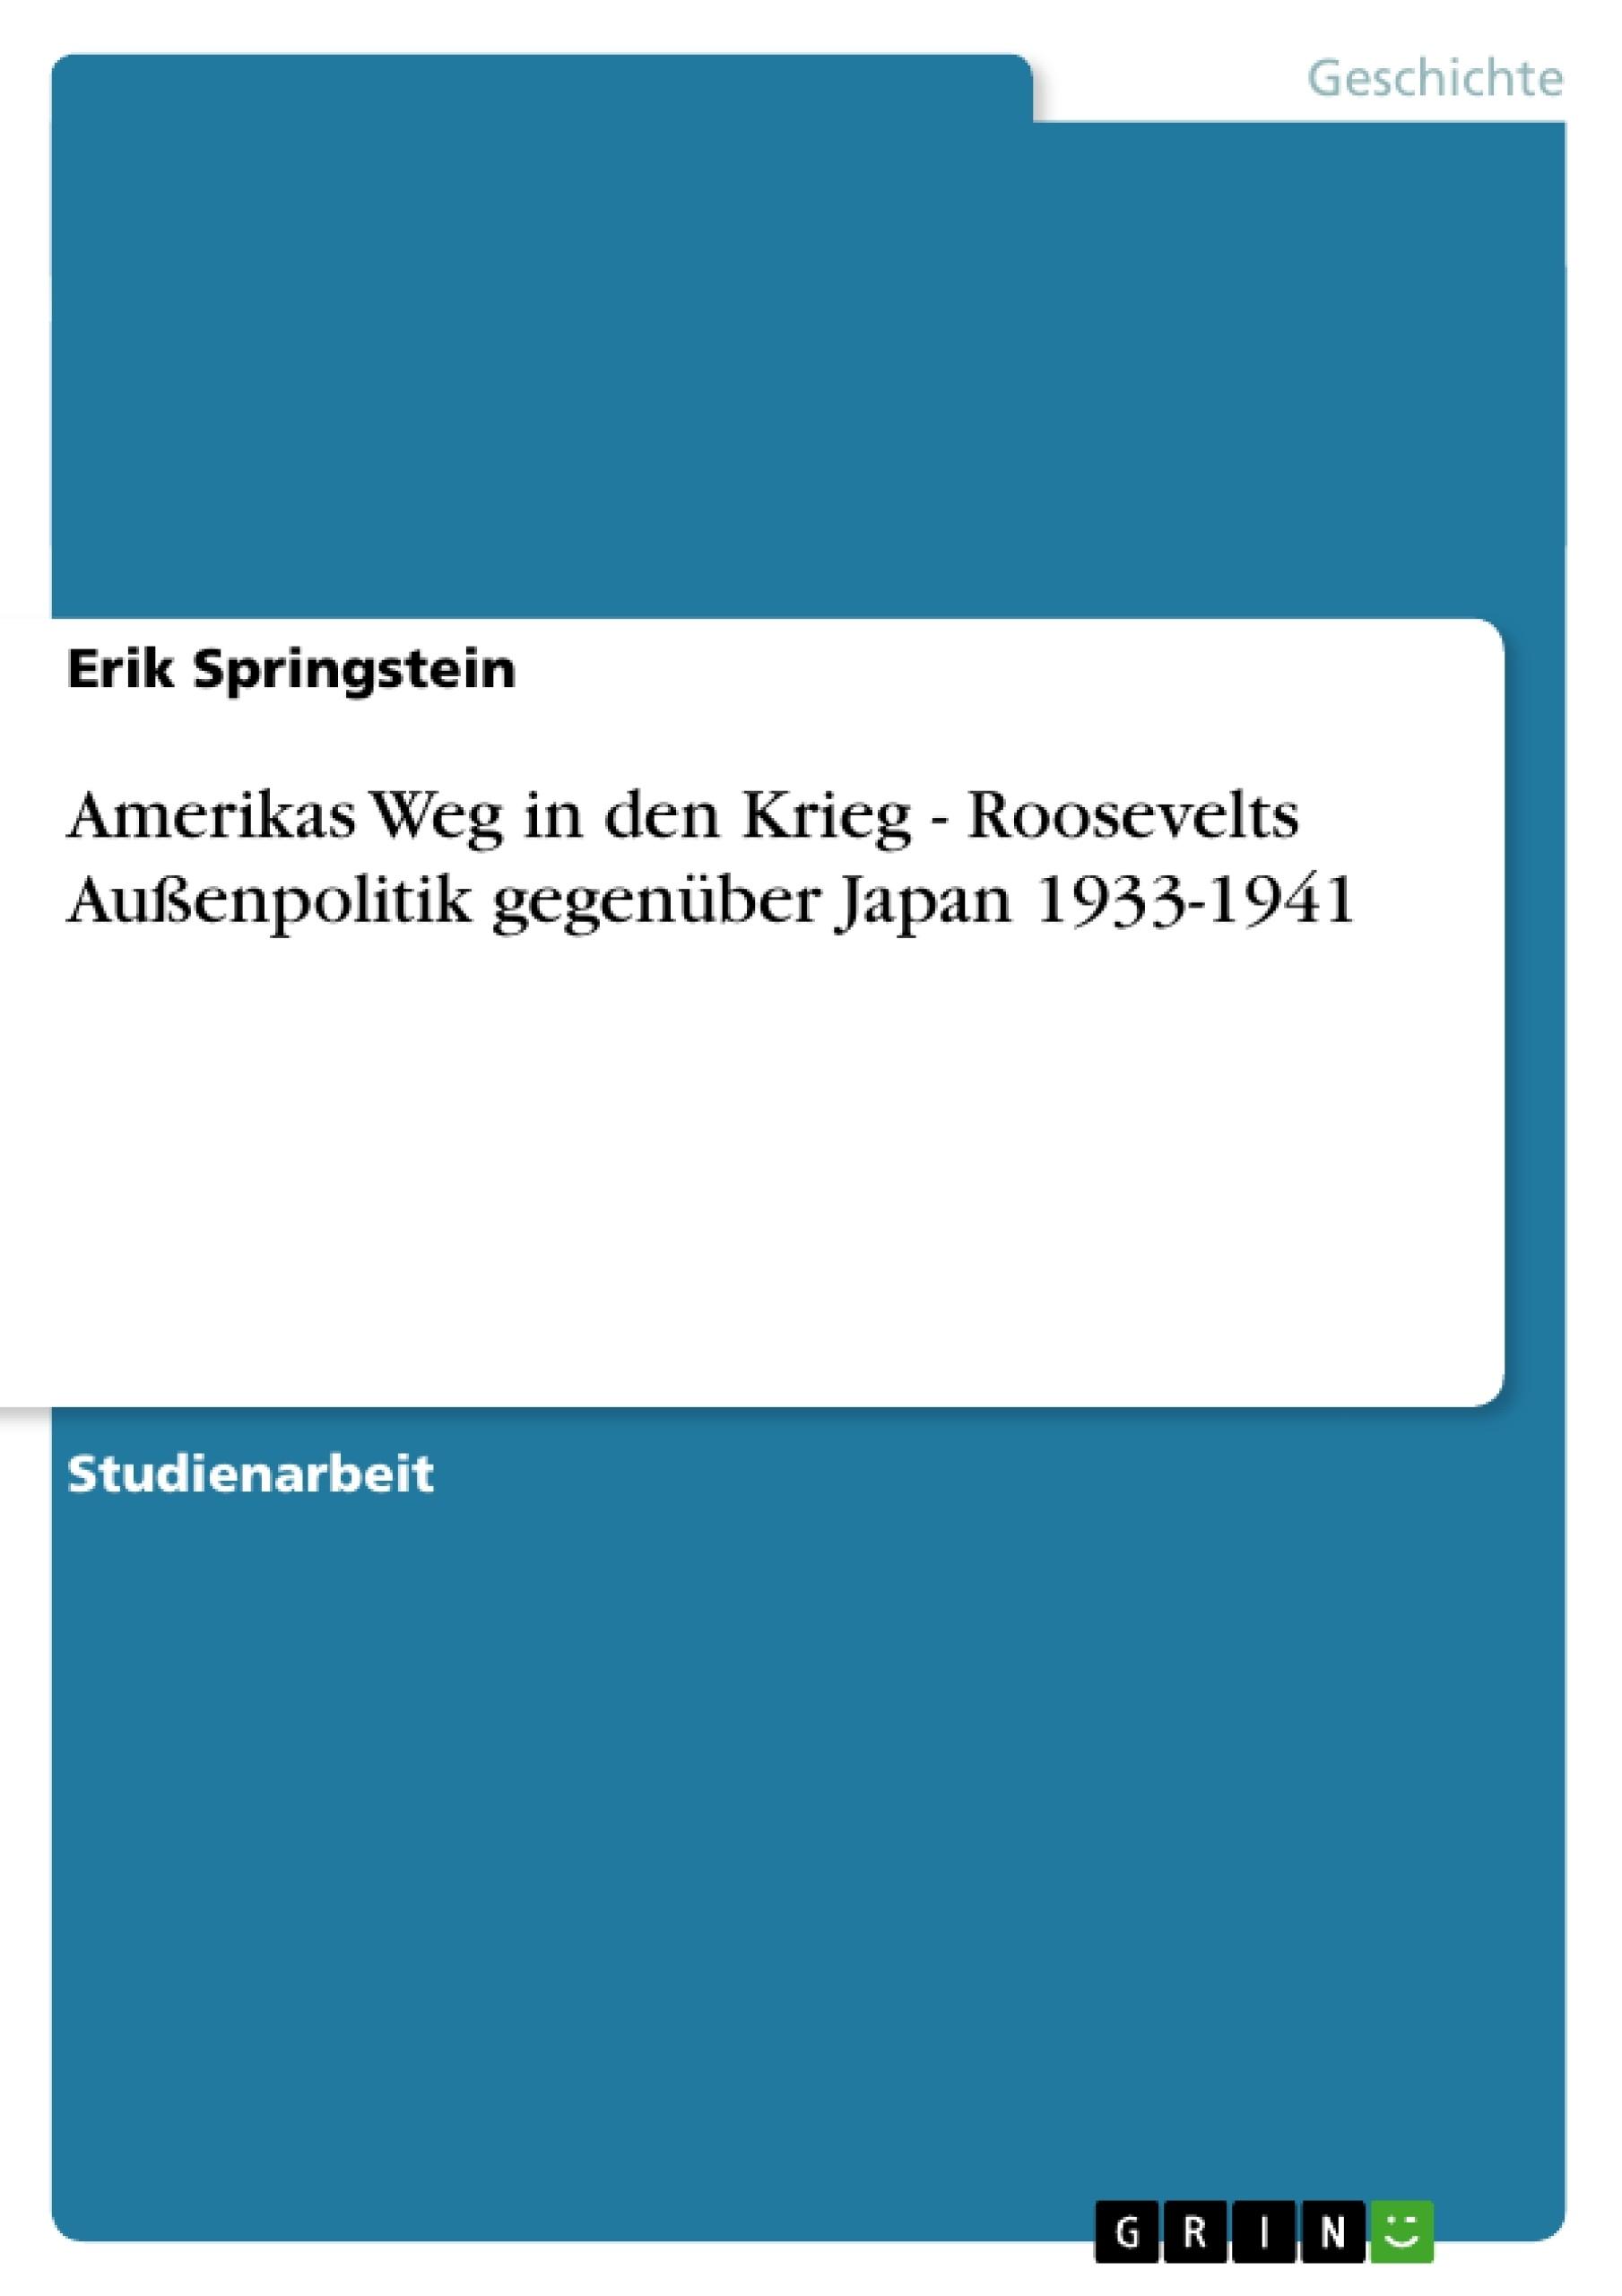 Titel: Amerikas Weg in den Krieg - Roosevelts Außenpolitik gegenüber Japan 1933-1941